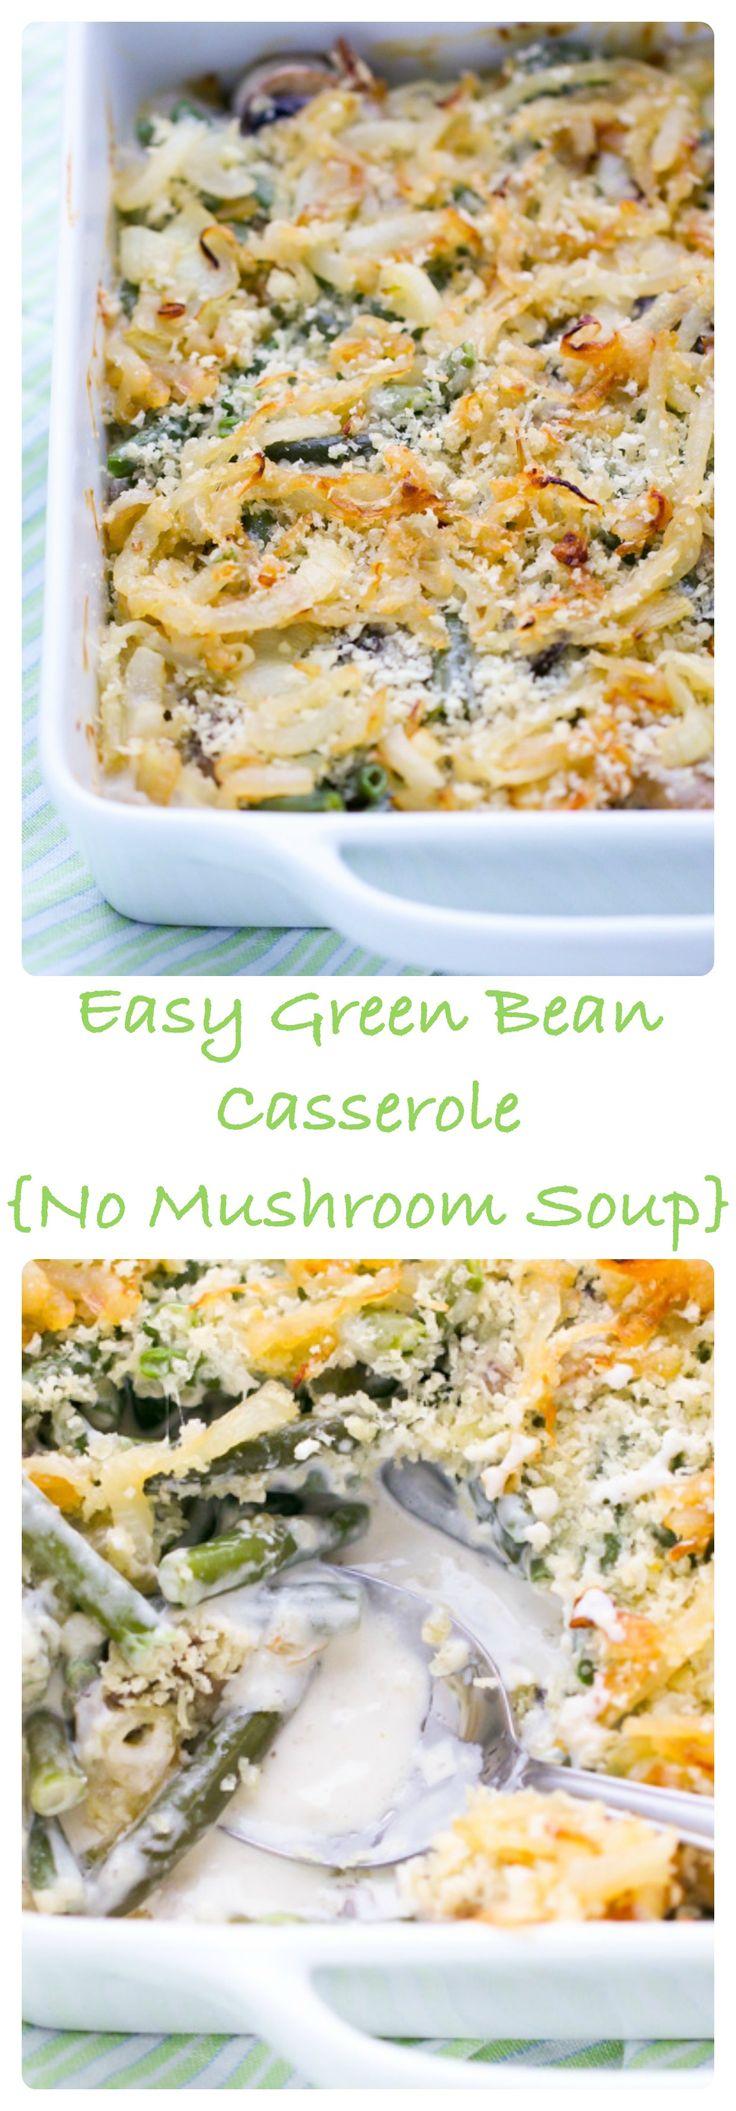 easy-green-bean-casserole-recipe-no-mushroom-soup